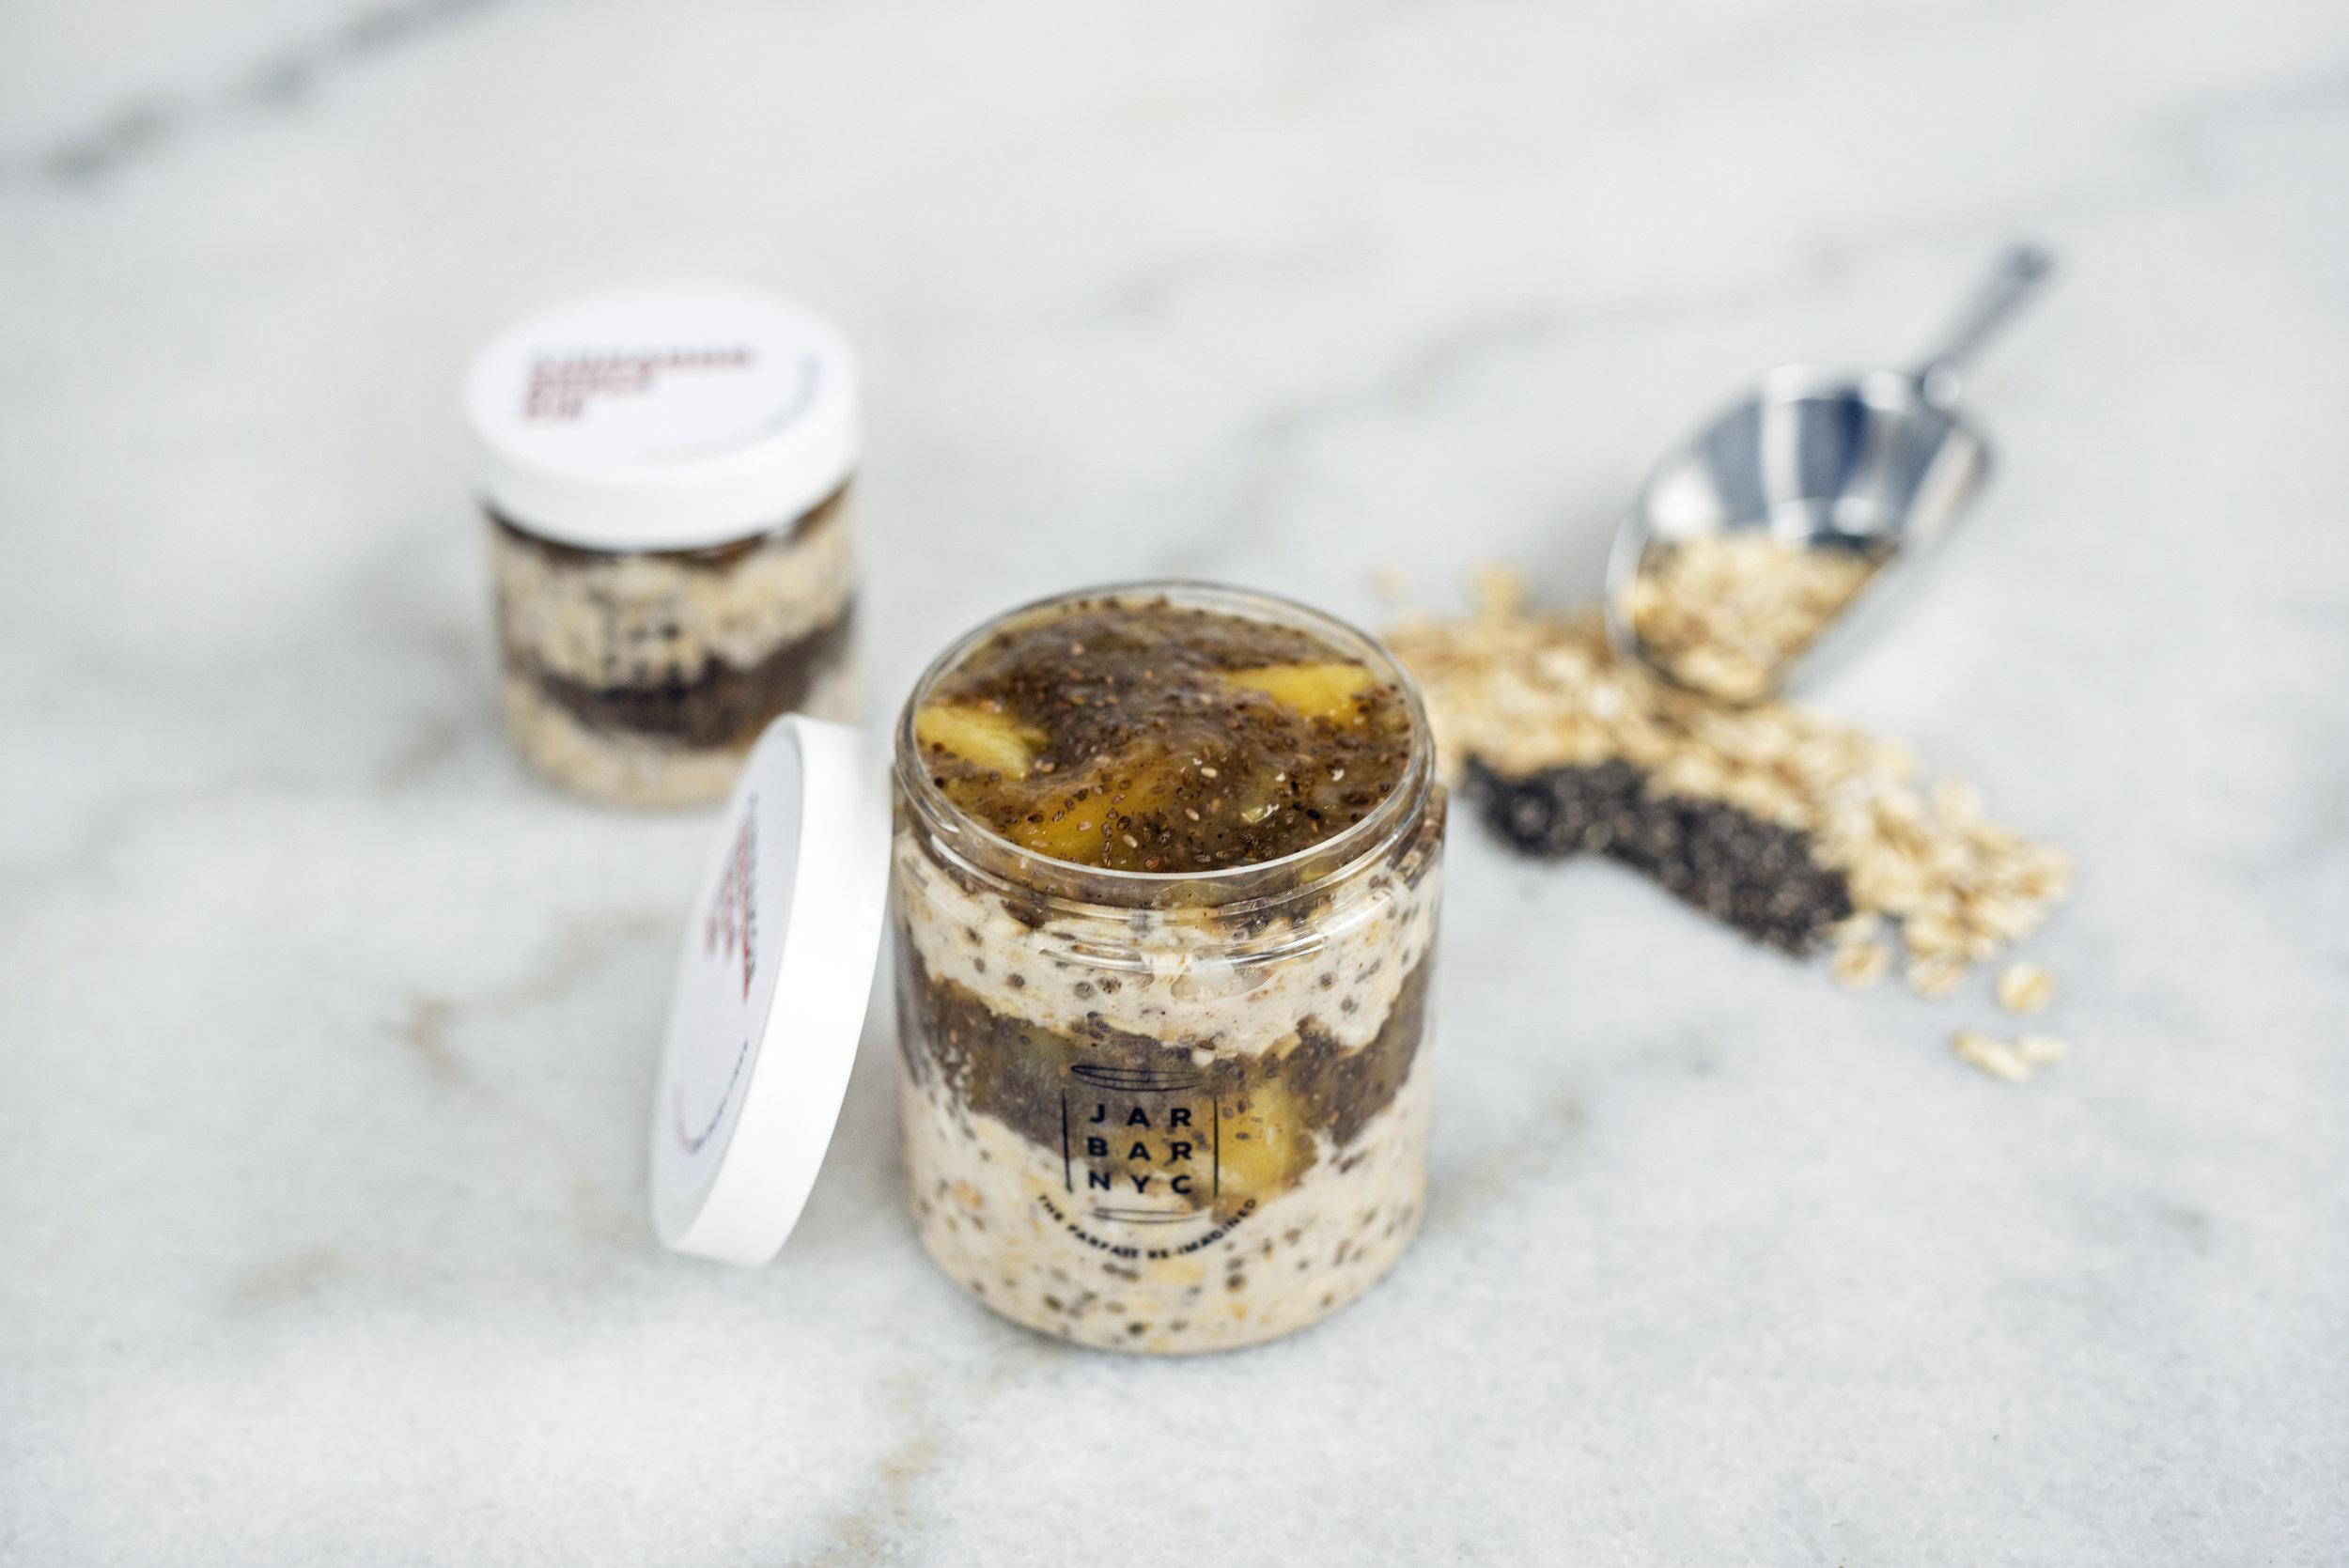 CINNAMON APPLE PIE JAR : apple jam layered with almond butter overnight oats.  Ingredients: apples, apple juice, chia seeds, oatmeal, unsweetened plain almond milk, almond butter, cinnamon, organic amber agave, fine sea salt.